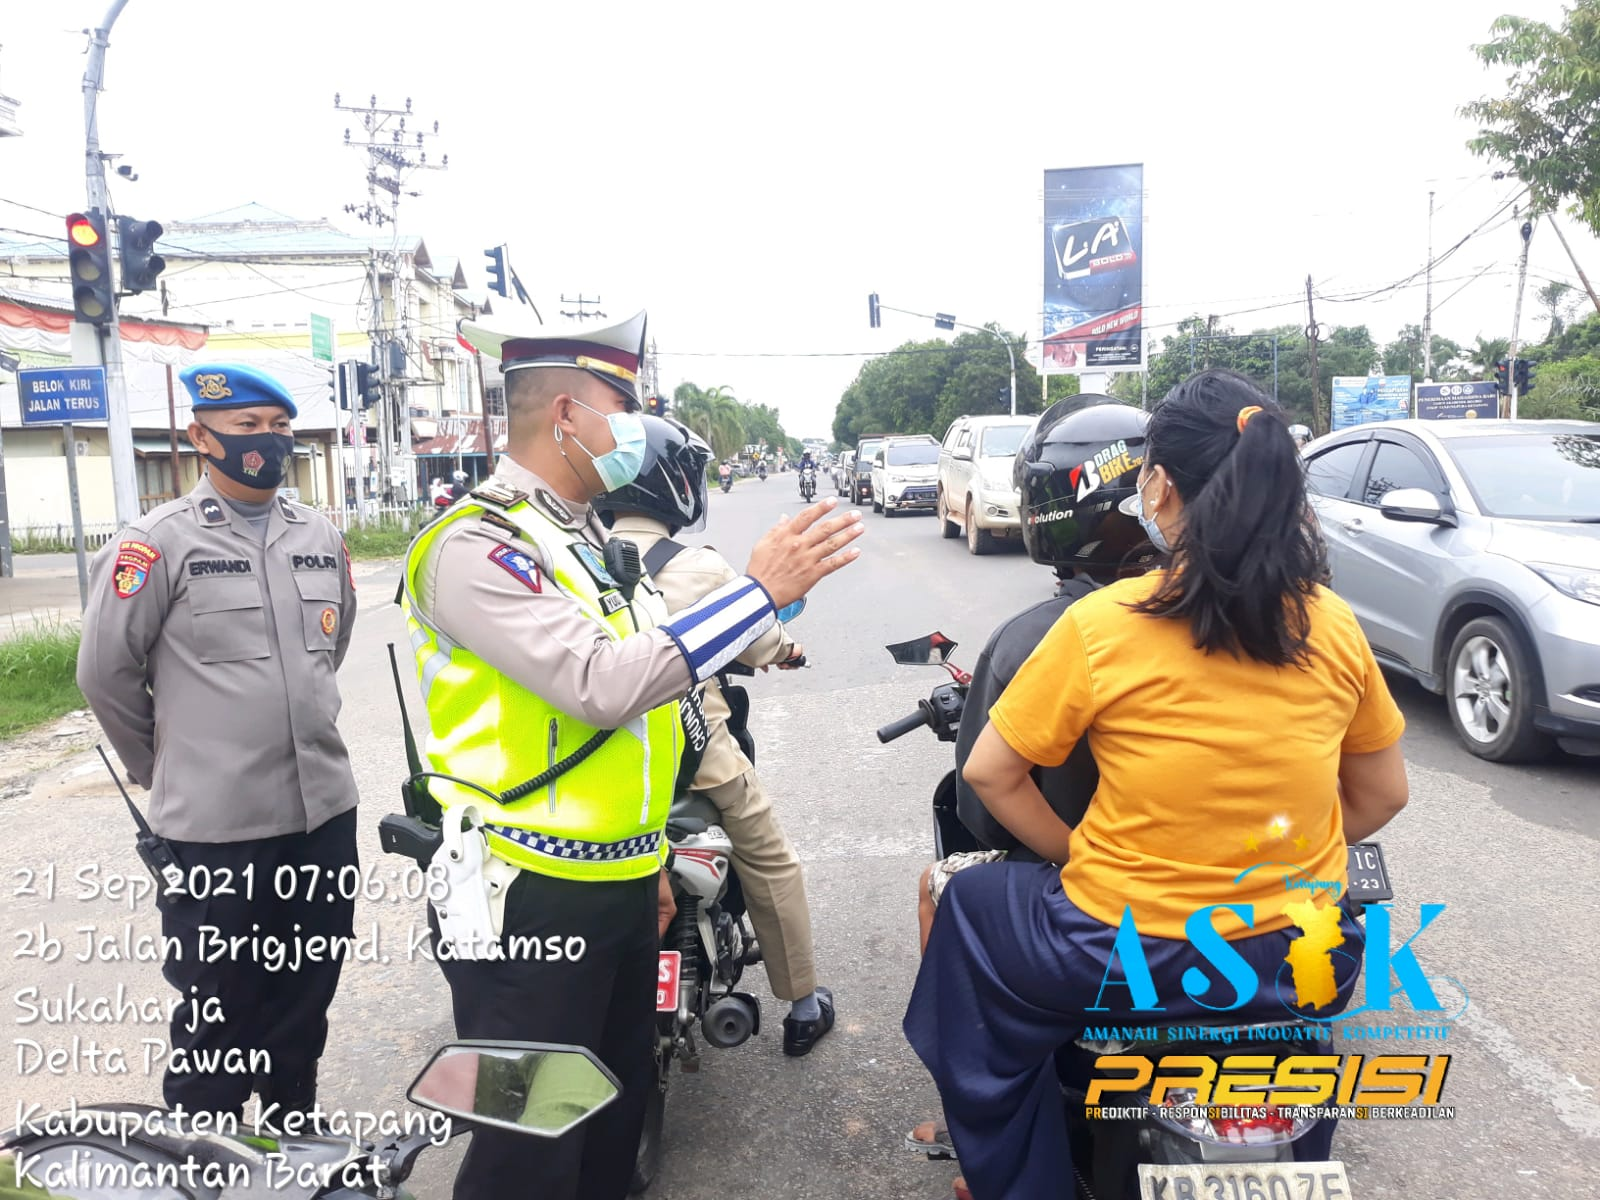 Ops Patuh Kapuas 2021 Satlantas Polres Ketapang laksanakan Imbauan Tertib berlalu lintas